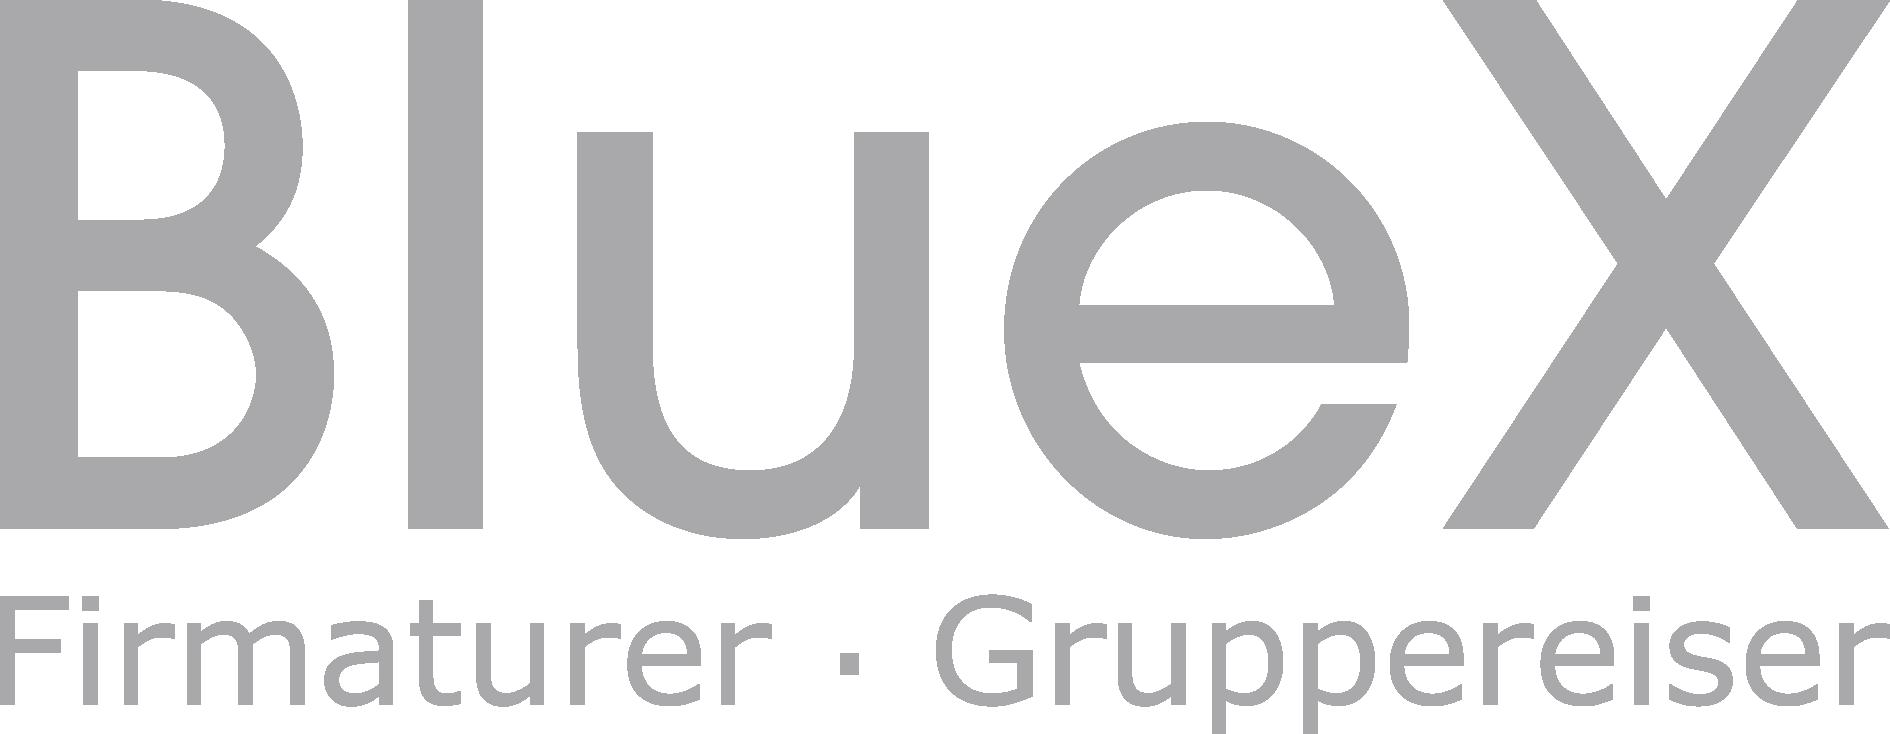 BlueX logo